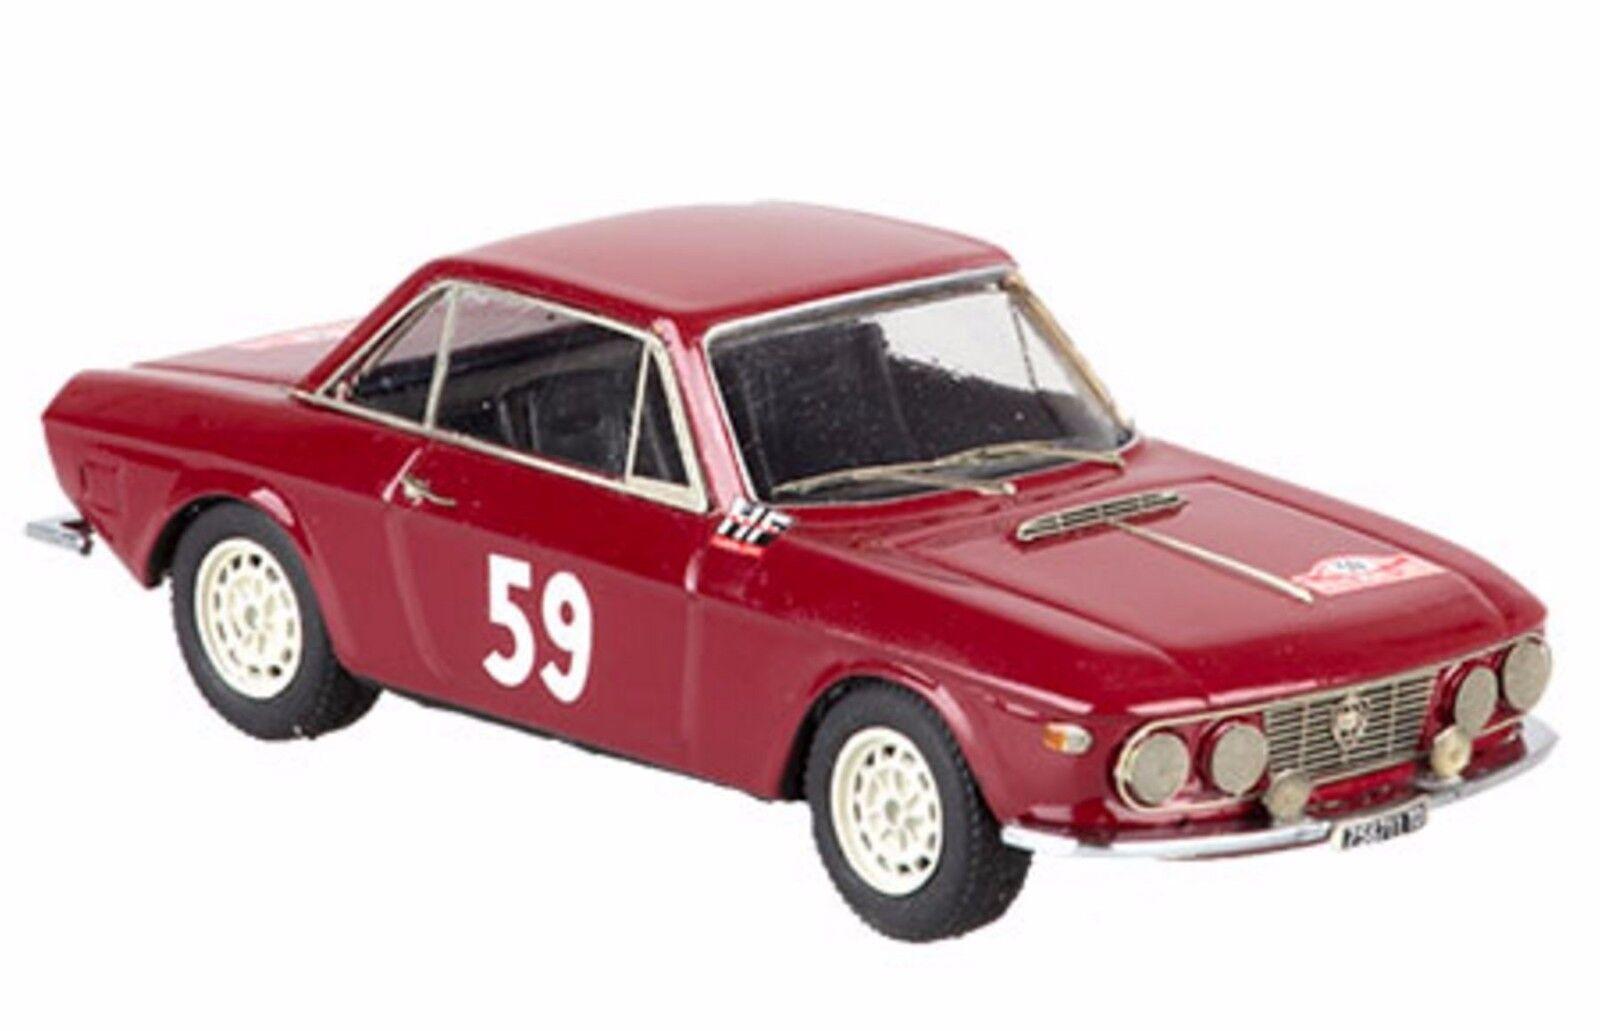 Kit Lancia Fulvia Coupè  59 Rally Montecarlo 1966 - Emmebi Modells kit 1 43